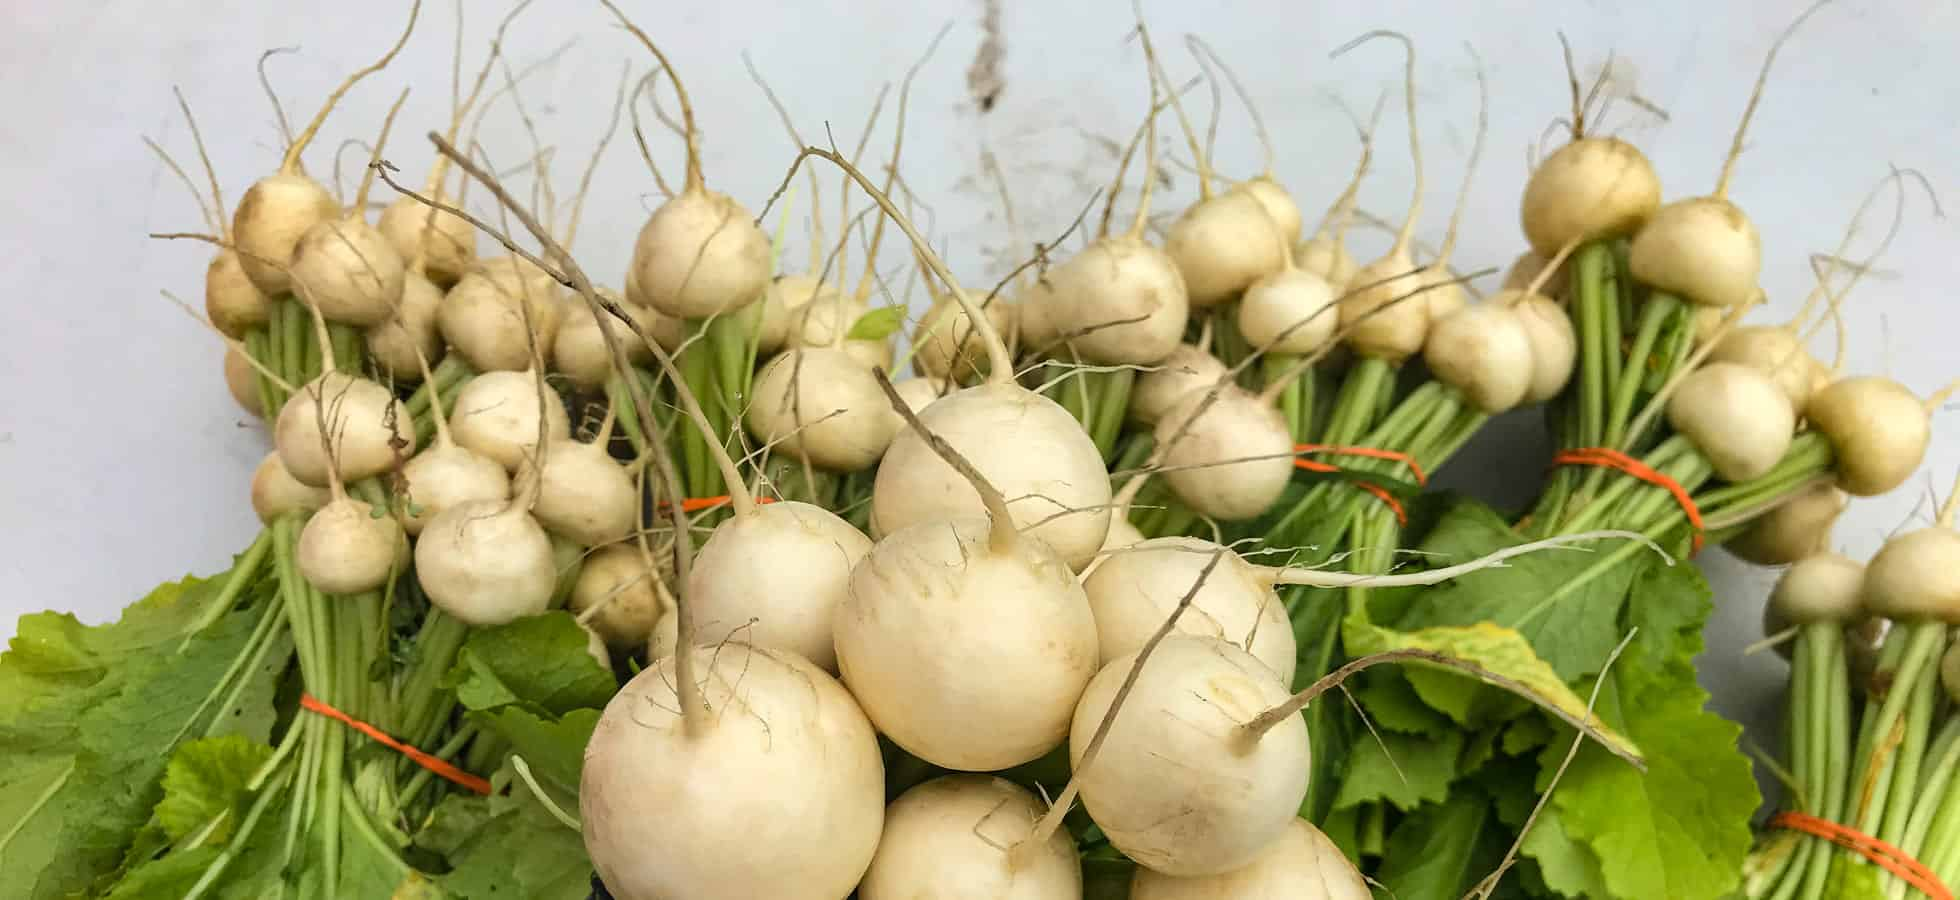 Turnips - Second Season Farm